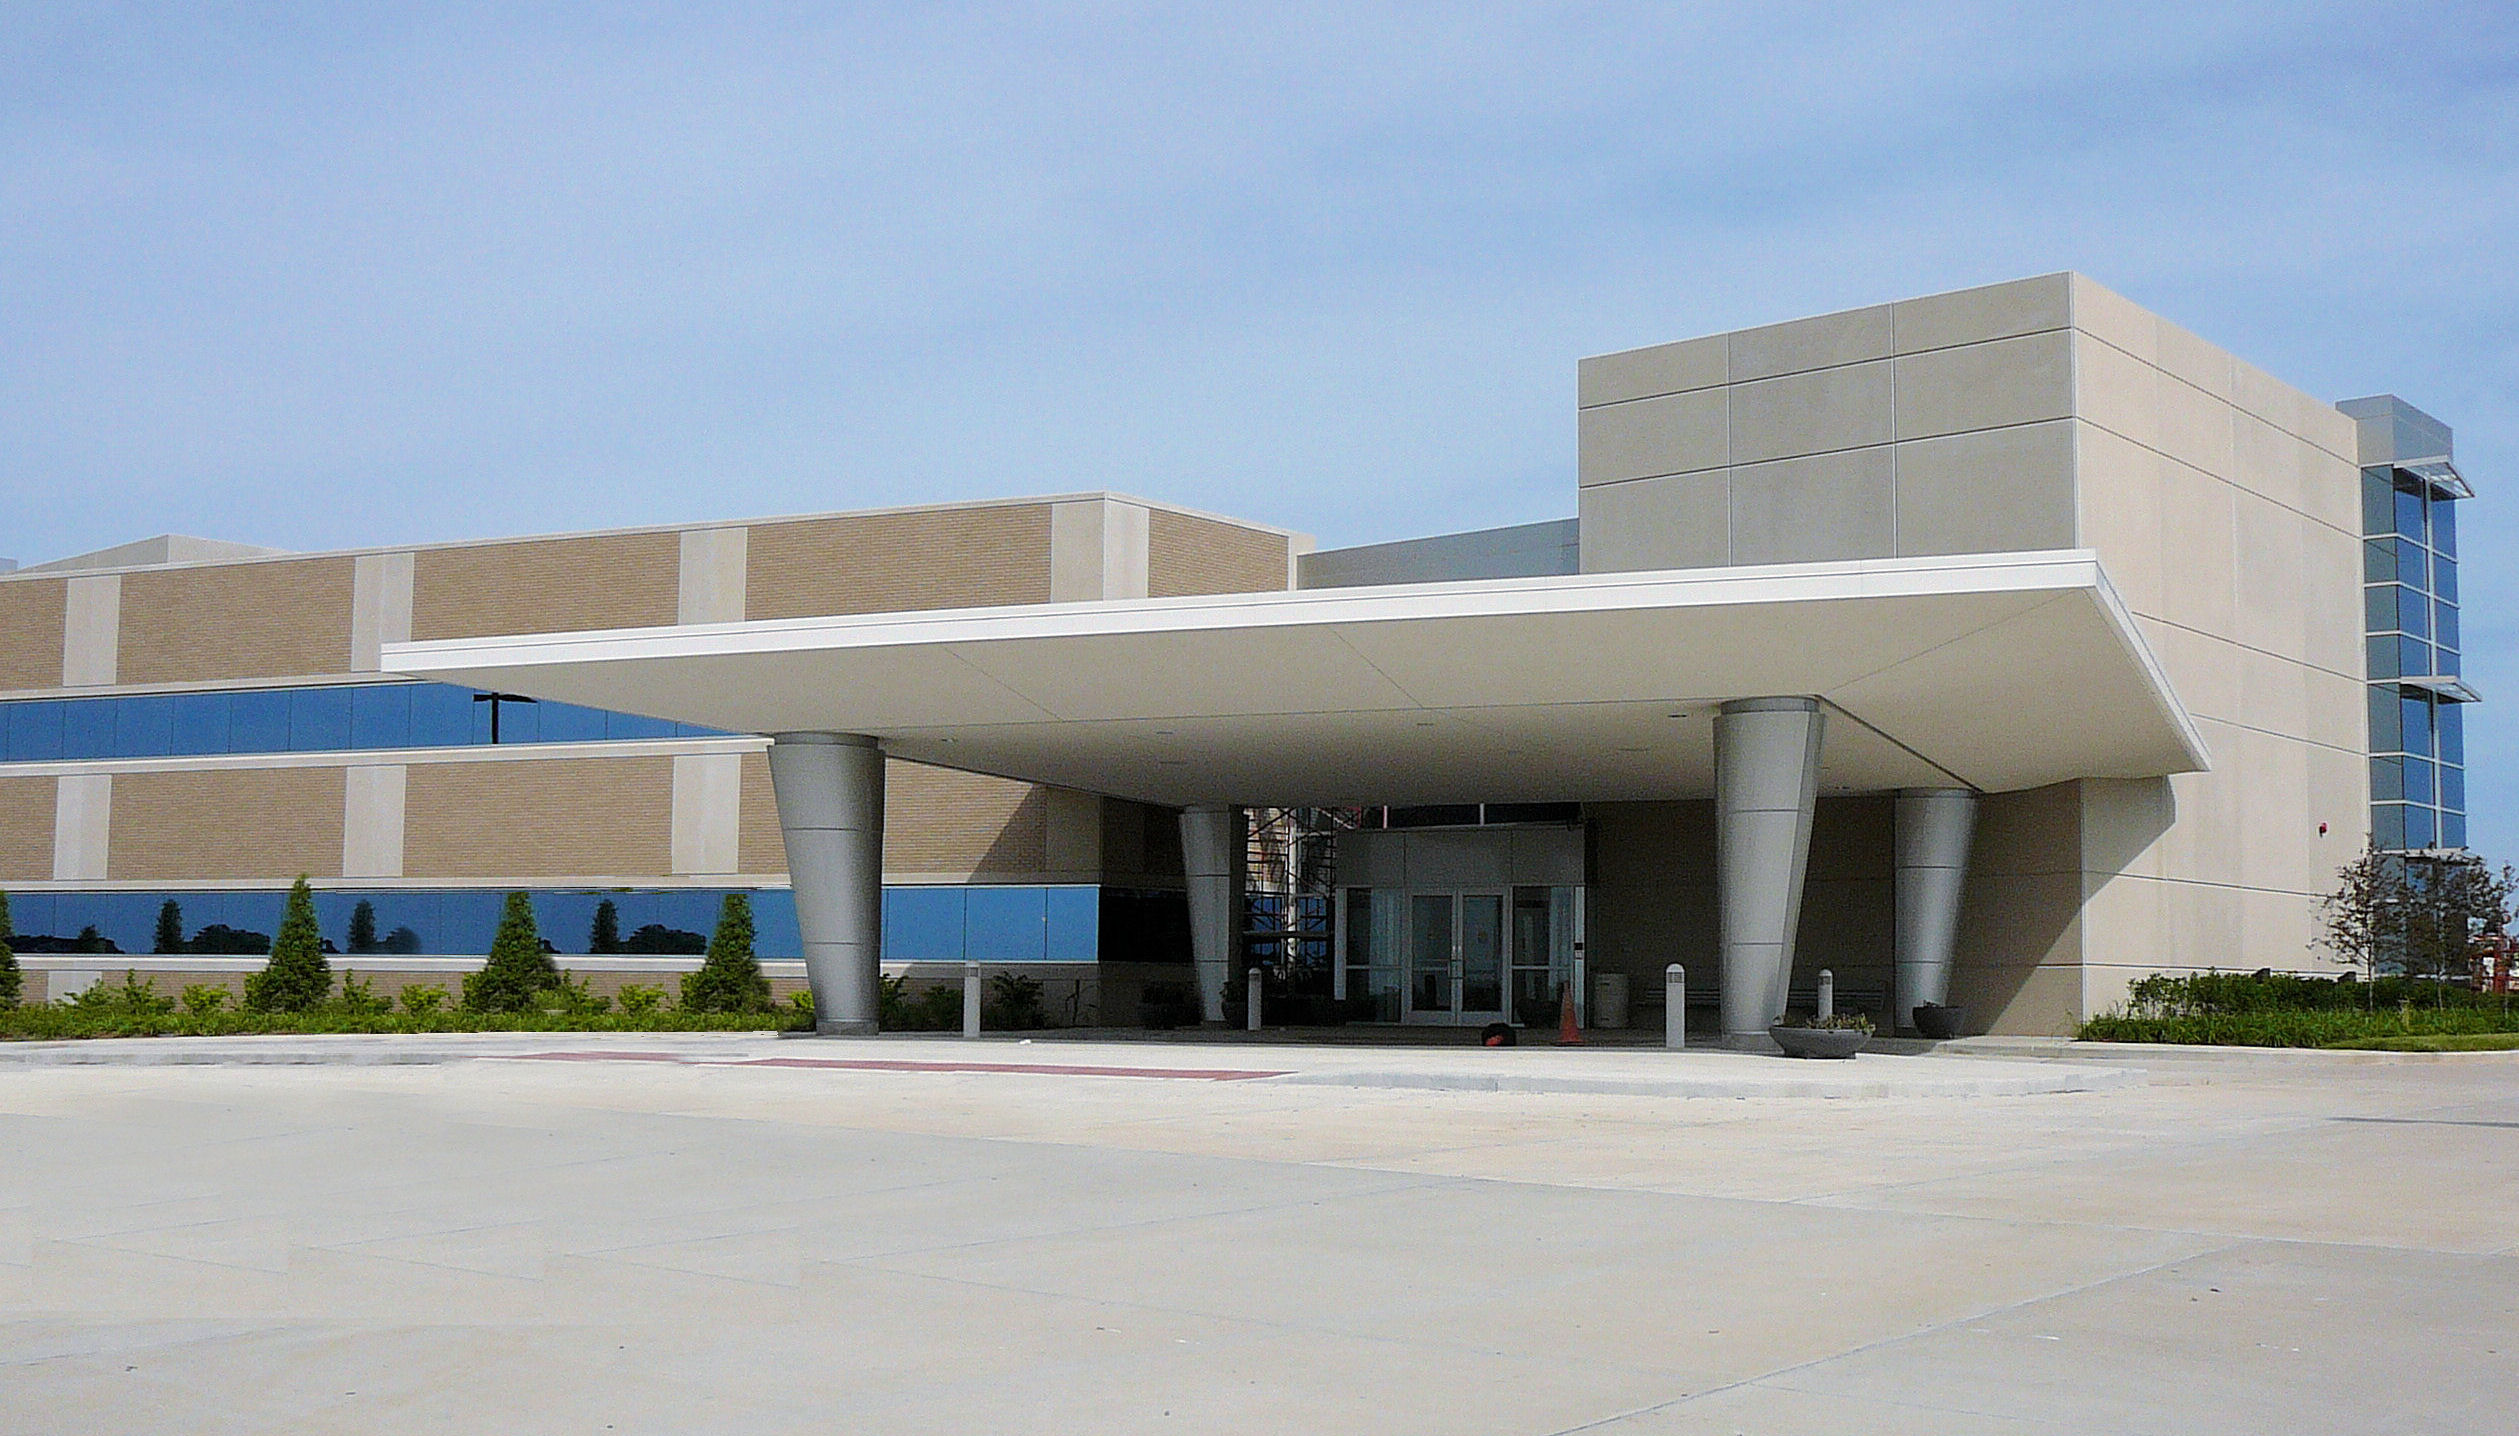 Southeast Missouri Hospital, West Campus, Cape Girardeau